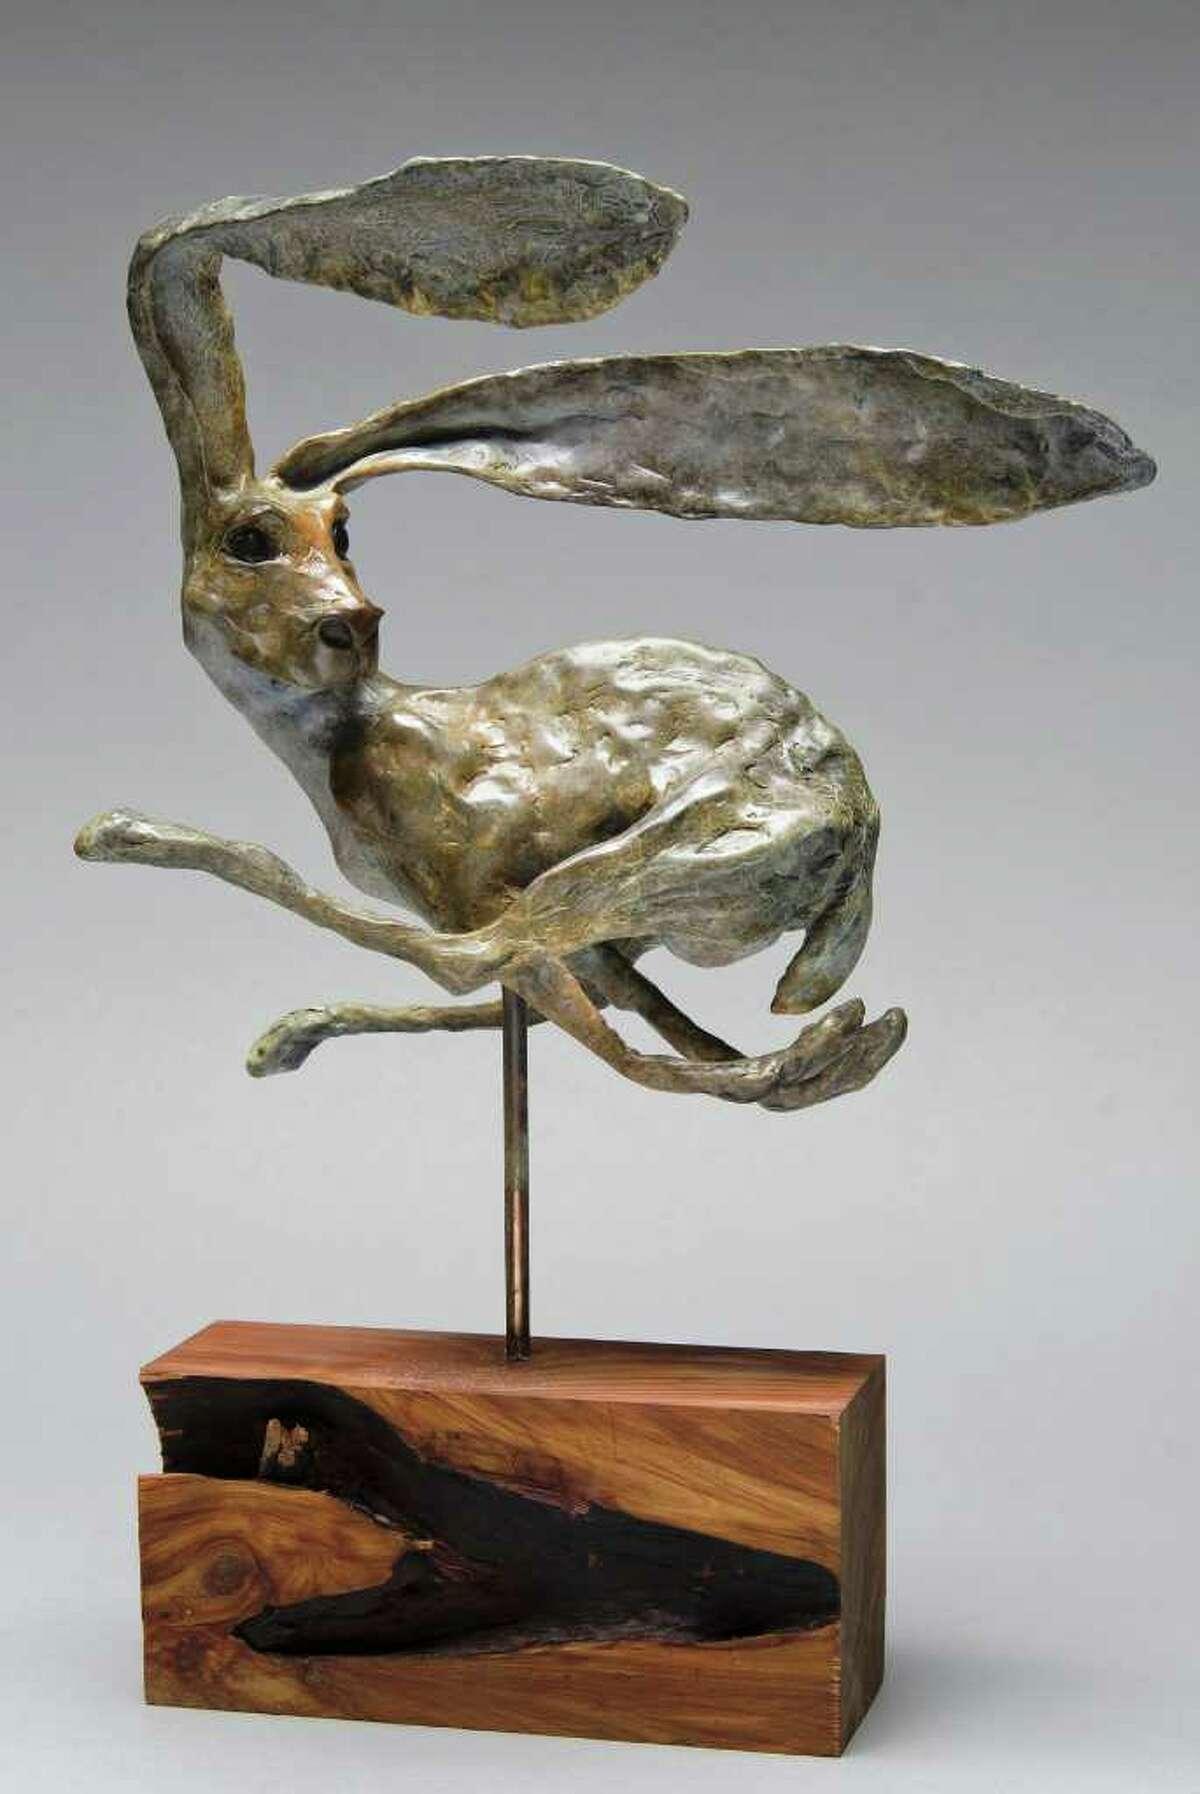 PARCHMAN STREMMEL GALLERY IN MOTION: ¡No Mira Atras! (Don't Look Back) features a jackrabbit in flight.